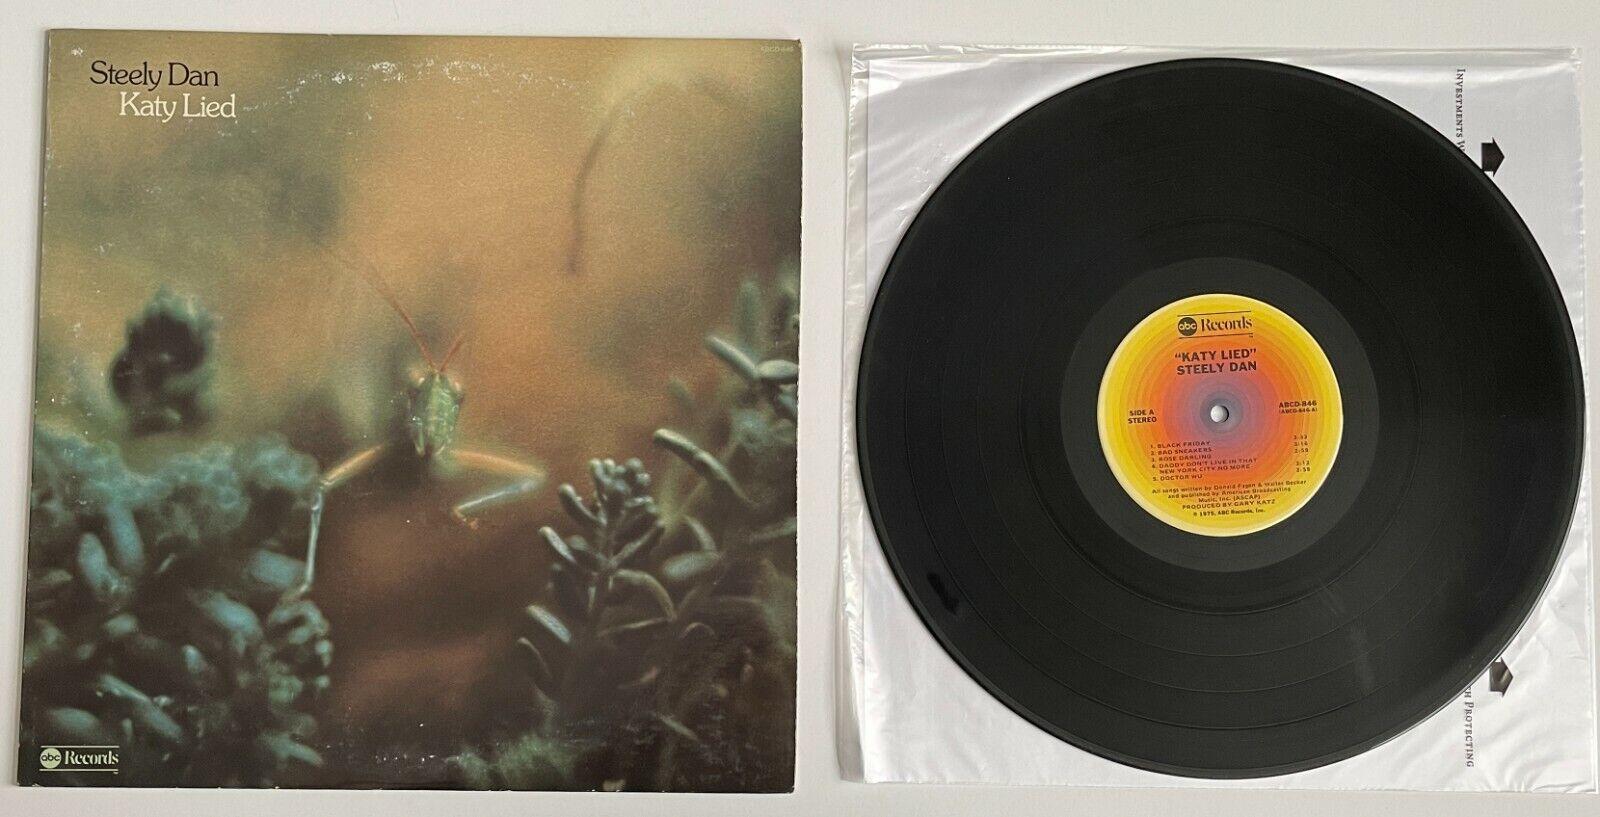 Steely Dan LP Katy Lied 1975 ABC Records ABCD-846 VG  - $22.06